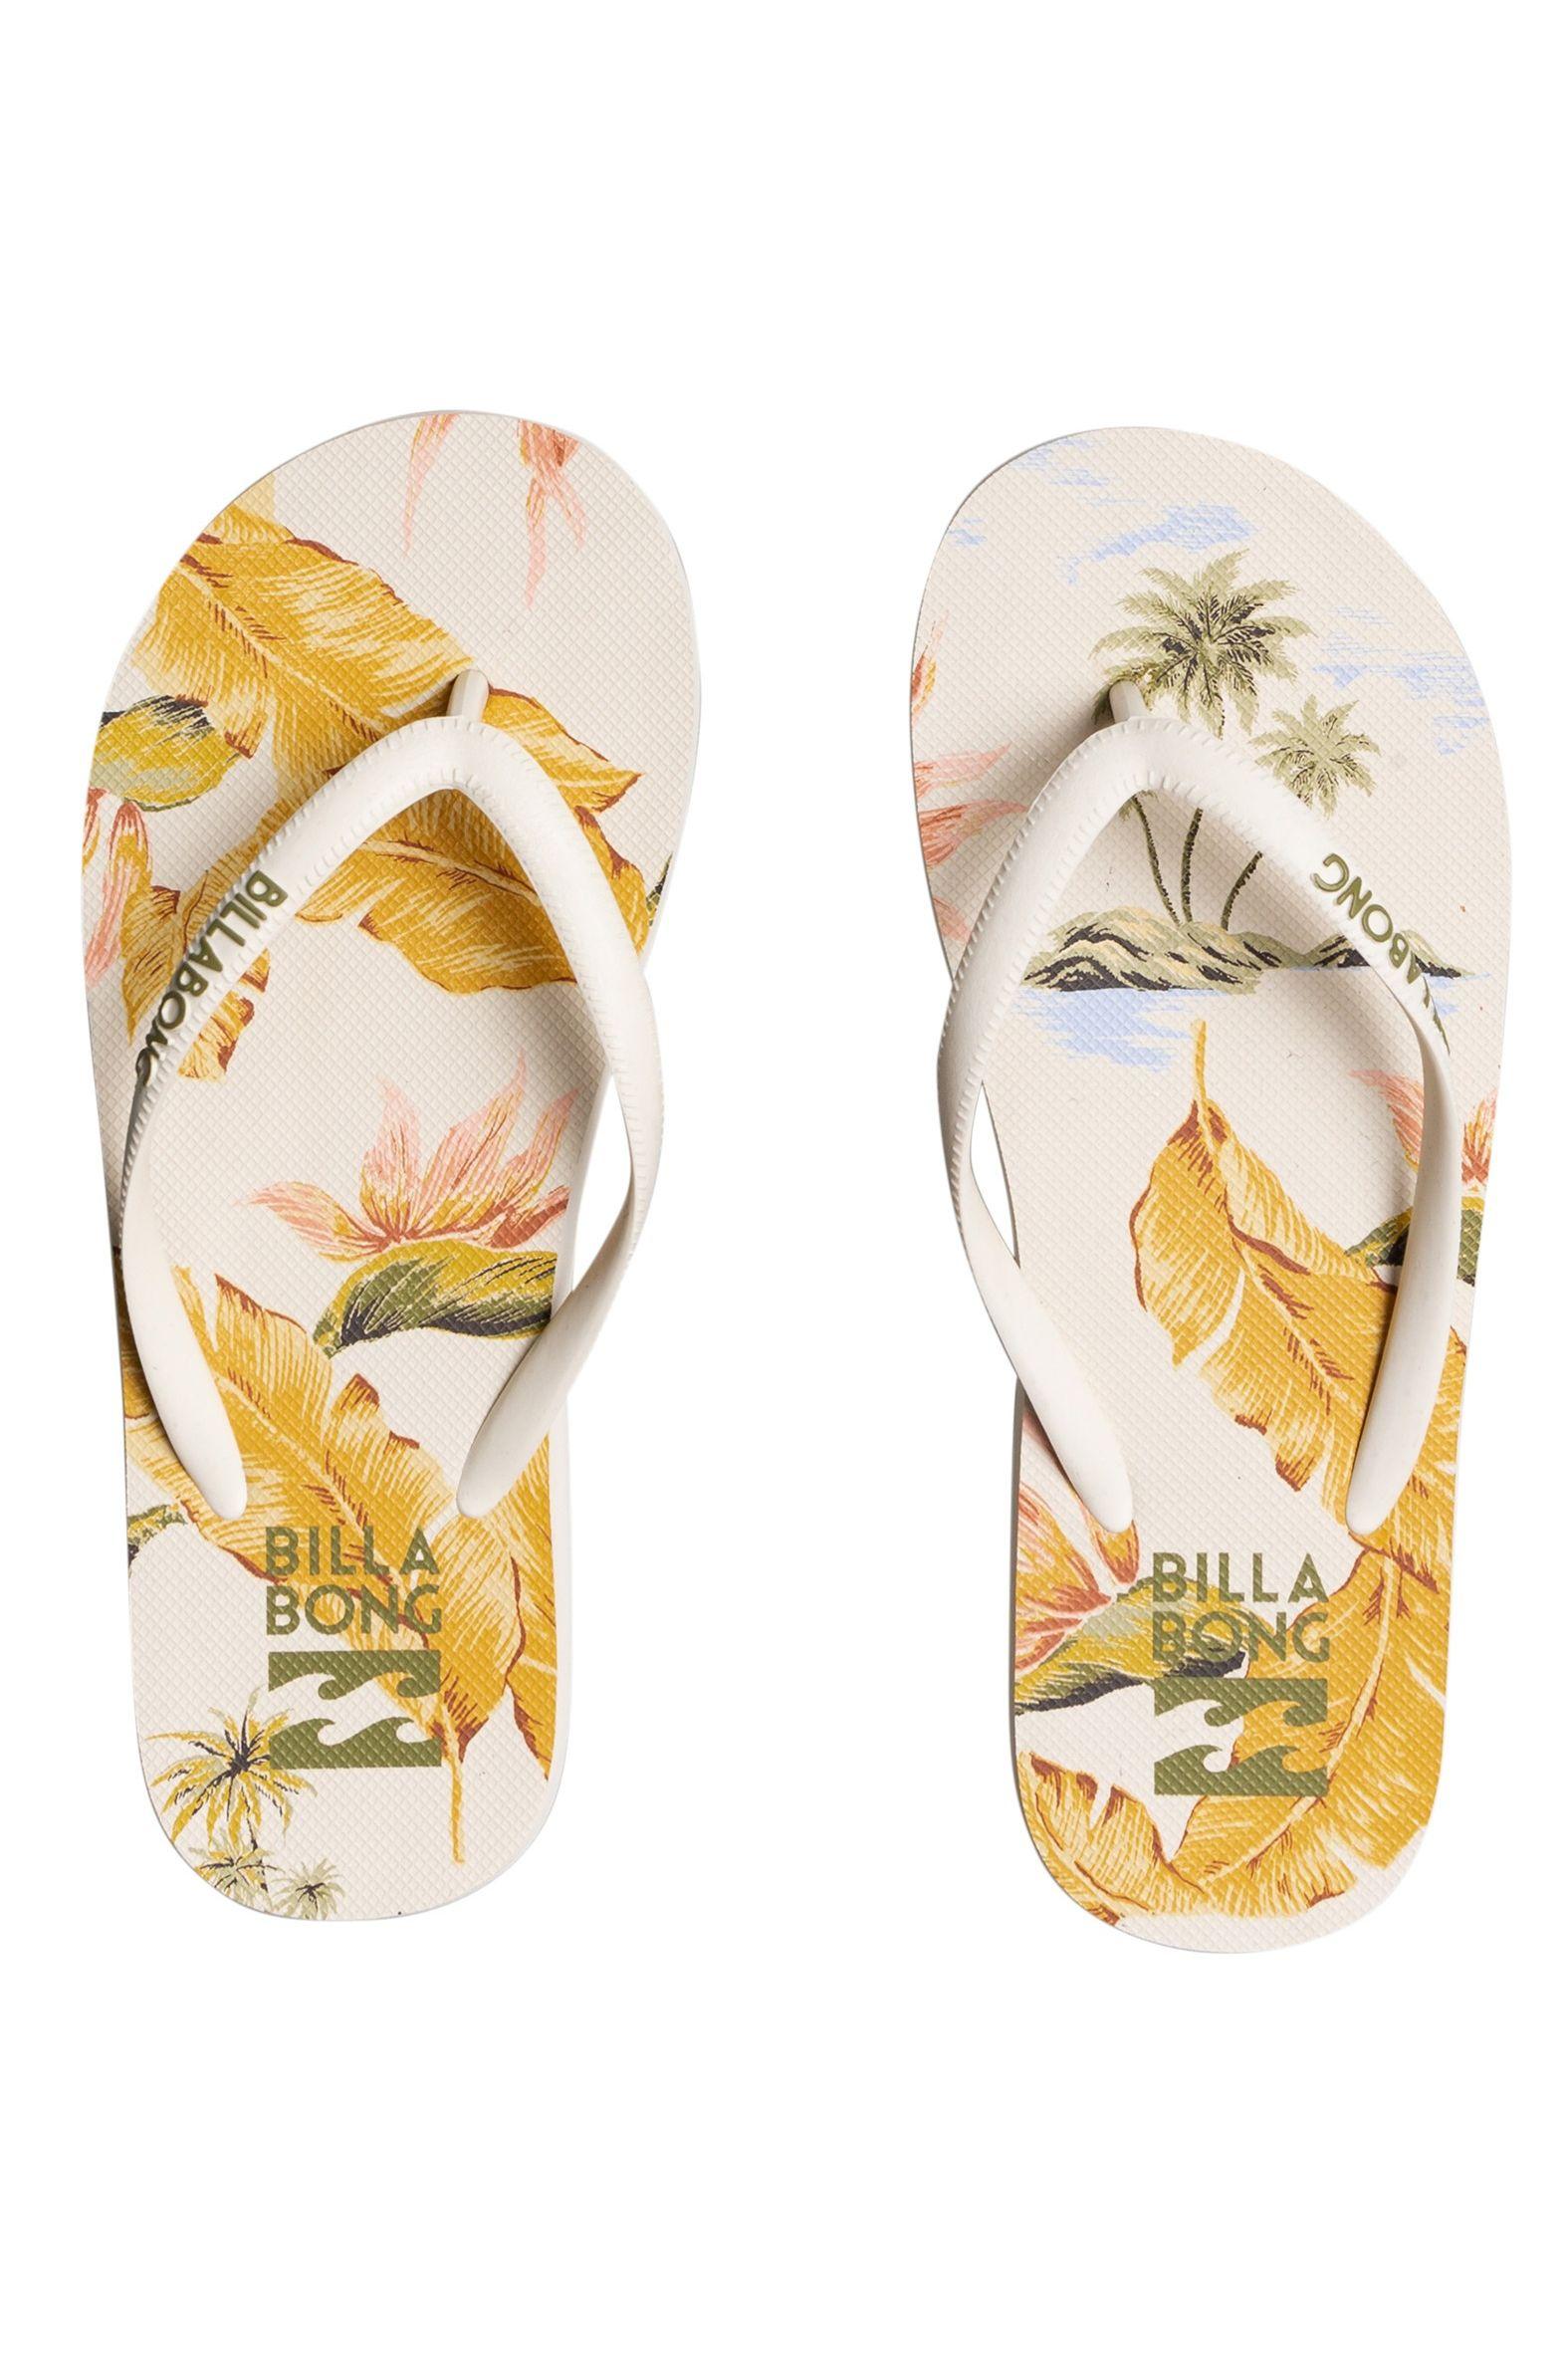 Billabong Sandals DAMA Canvas